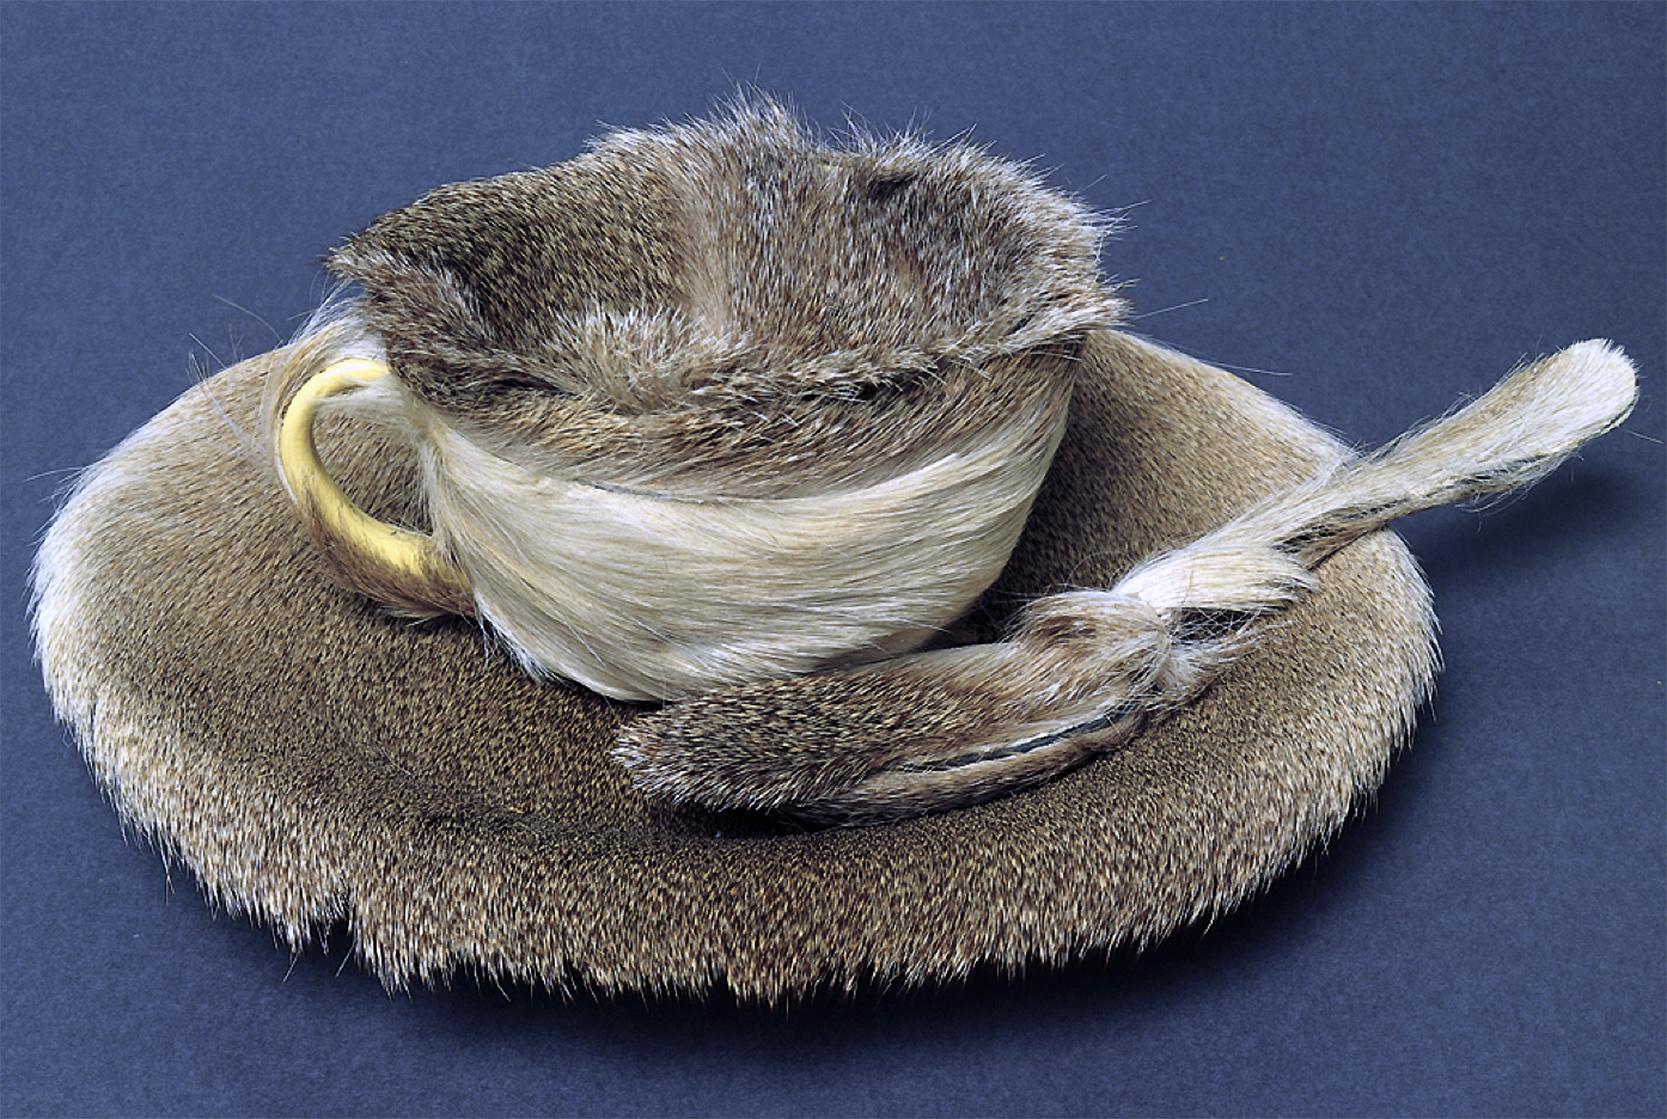 Meret Oppenheim: Obiekt (filiżanka, spodek i łyżeczka